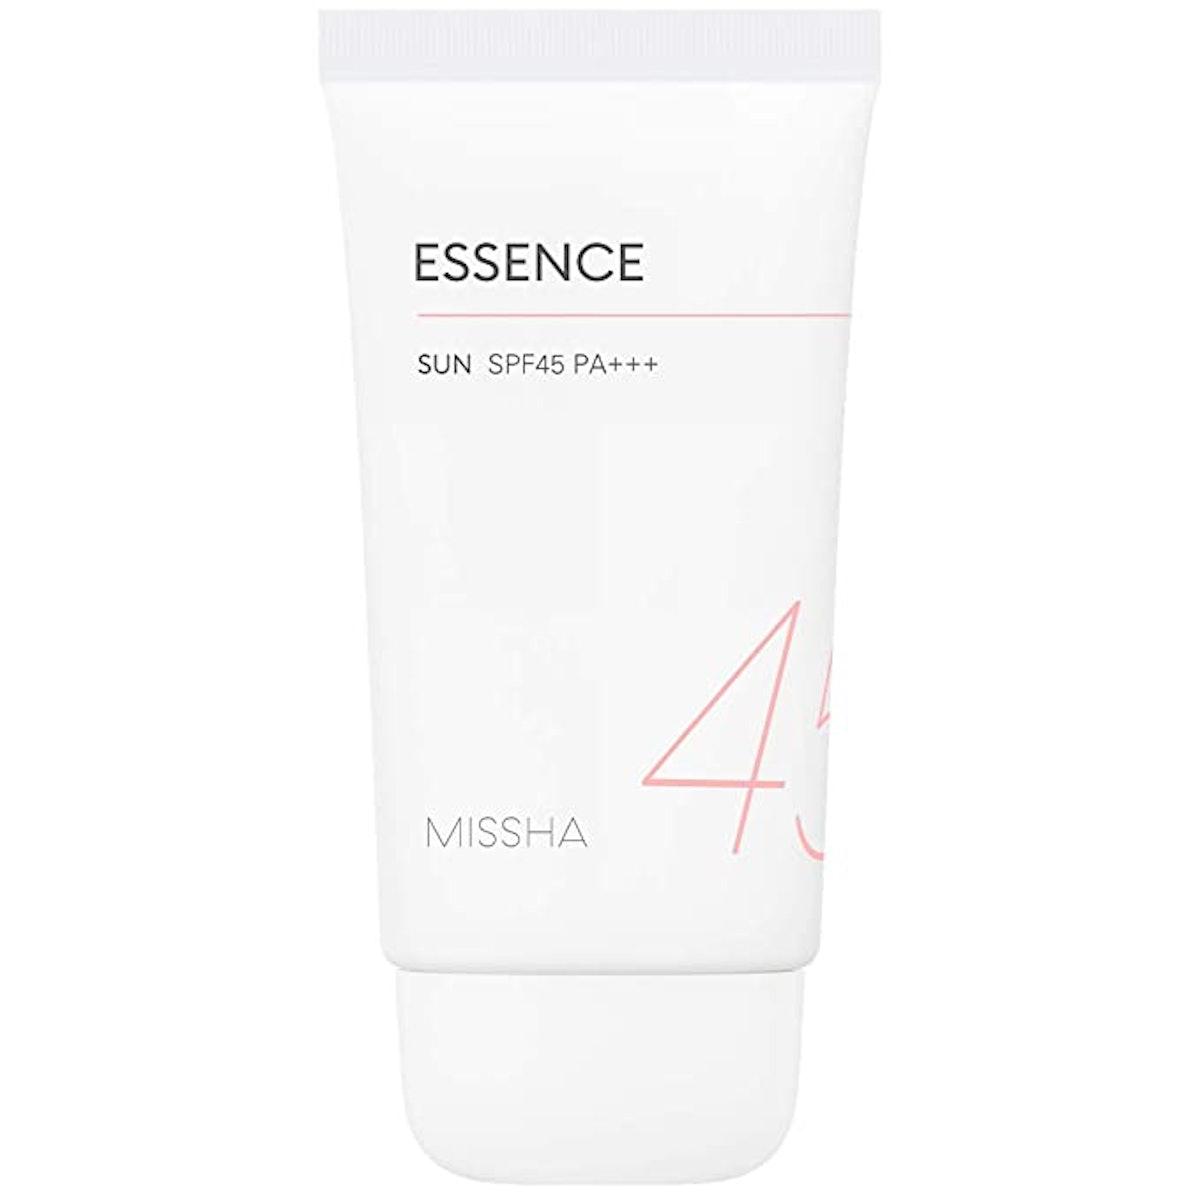 MISSHA Essence Sun SPF45